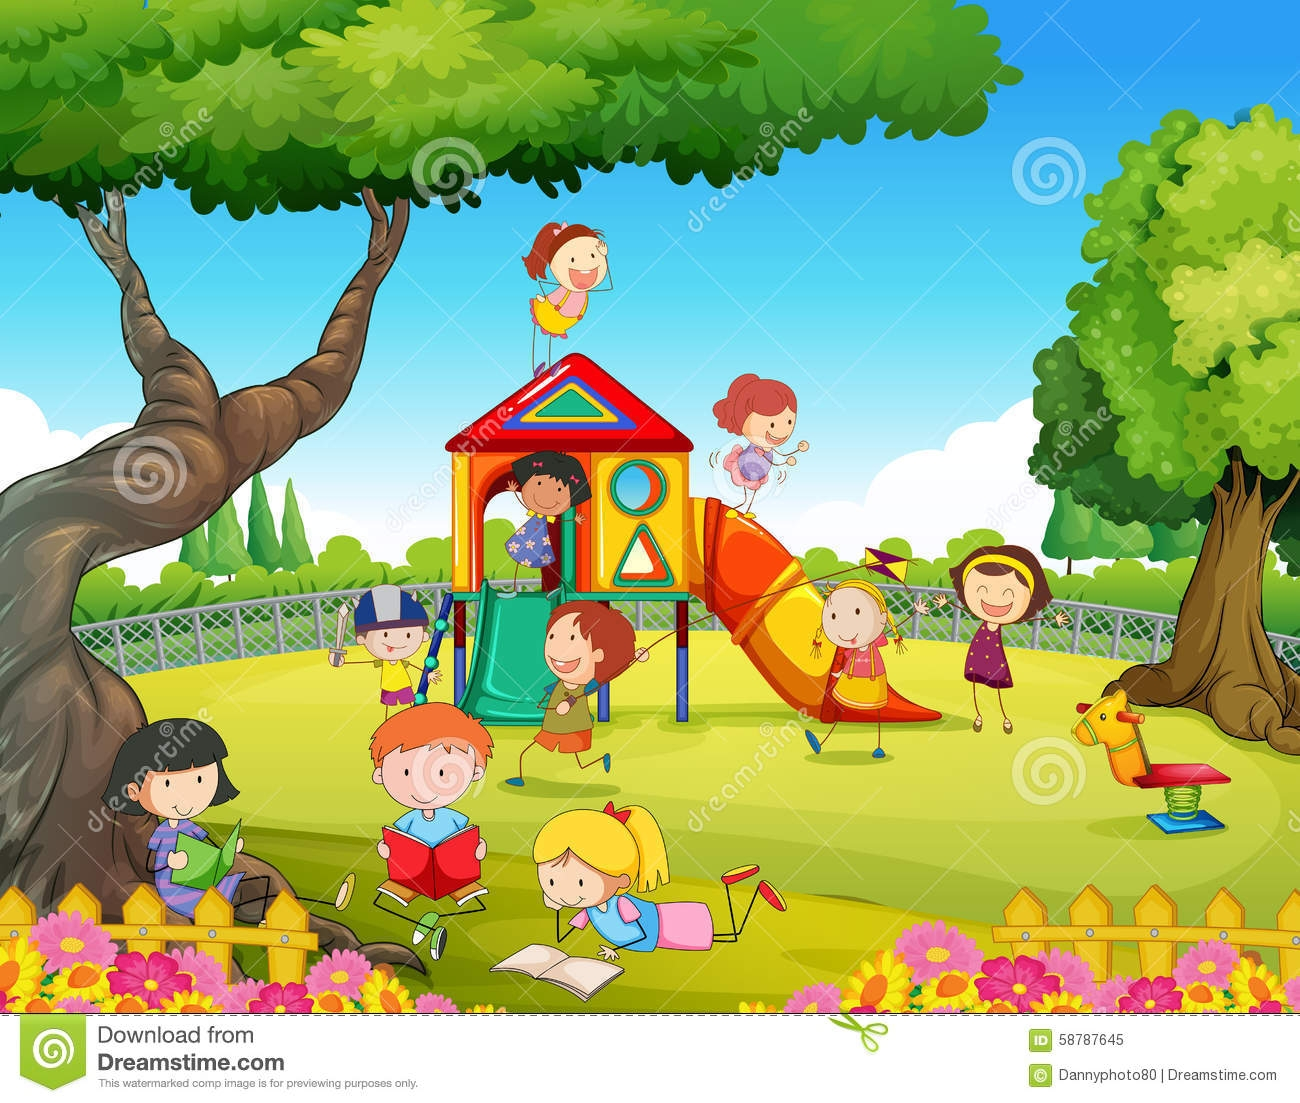 Children playing on playground clipart.